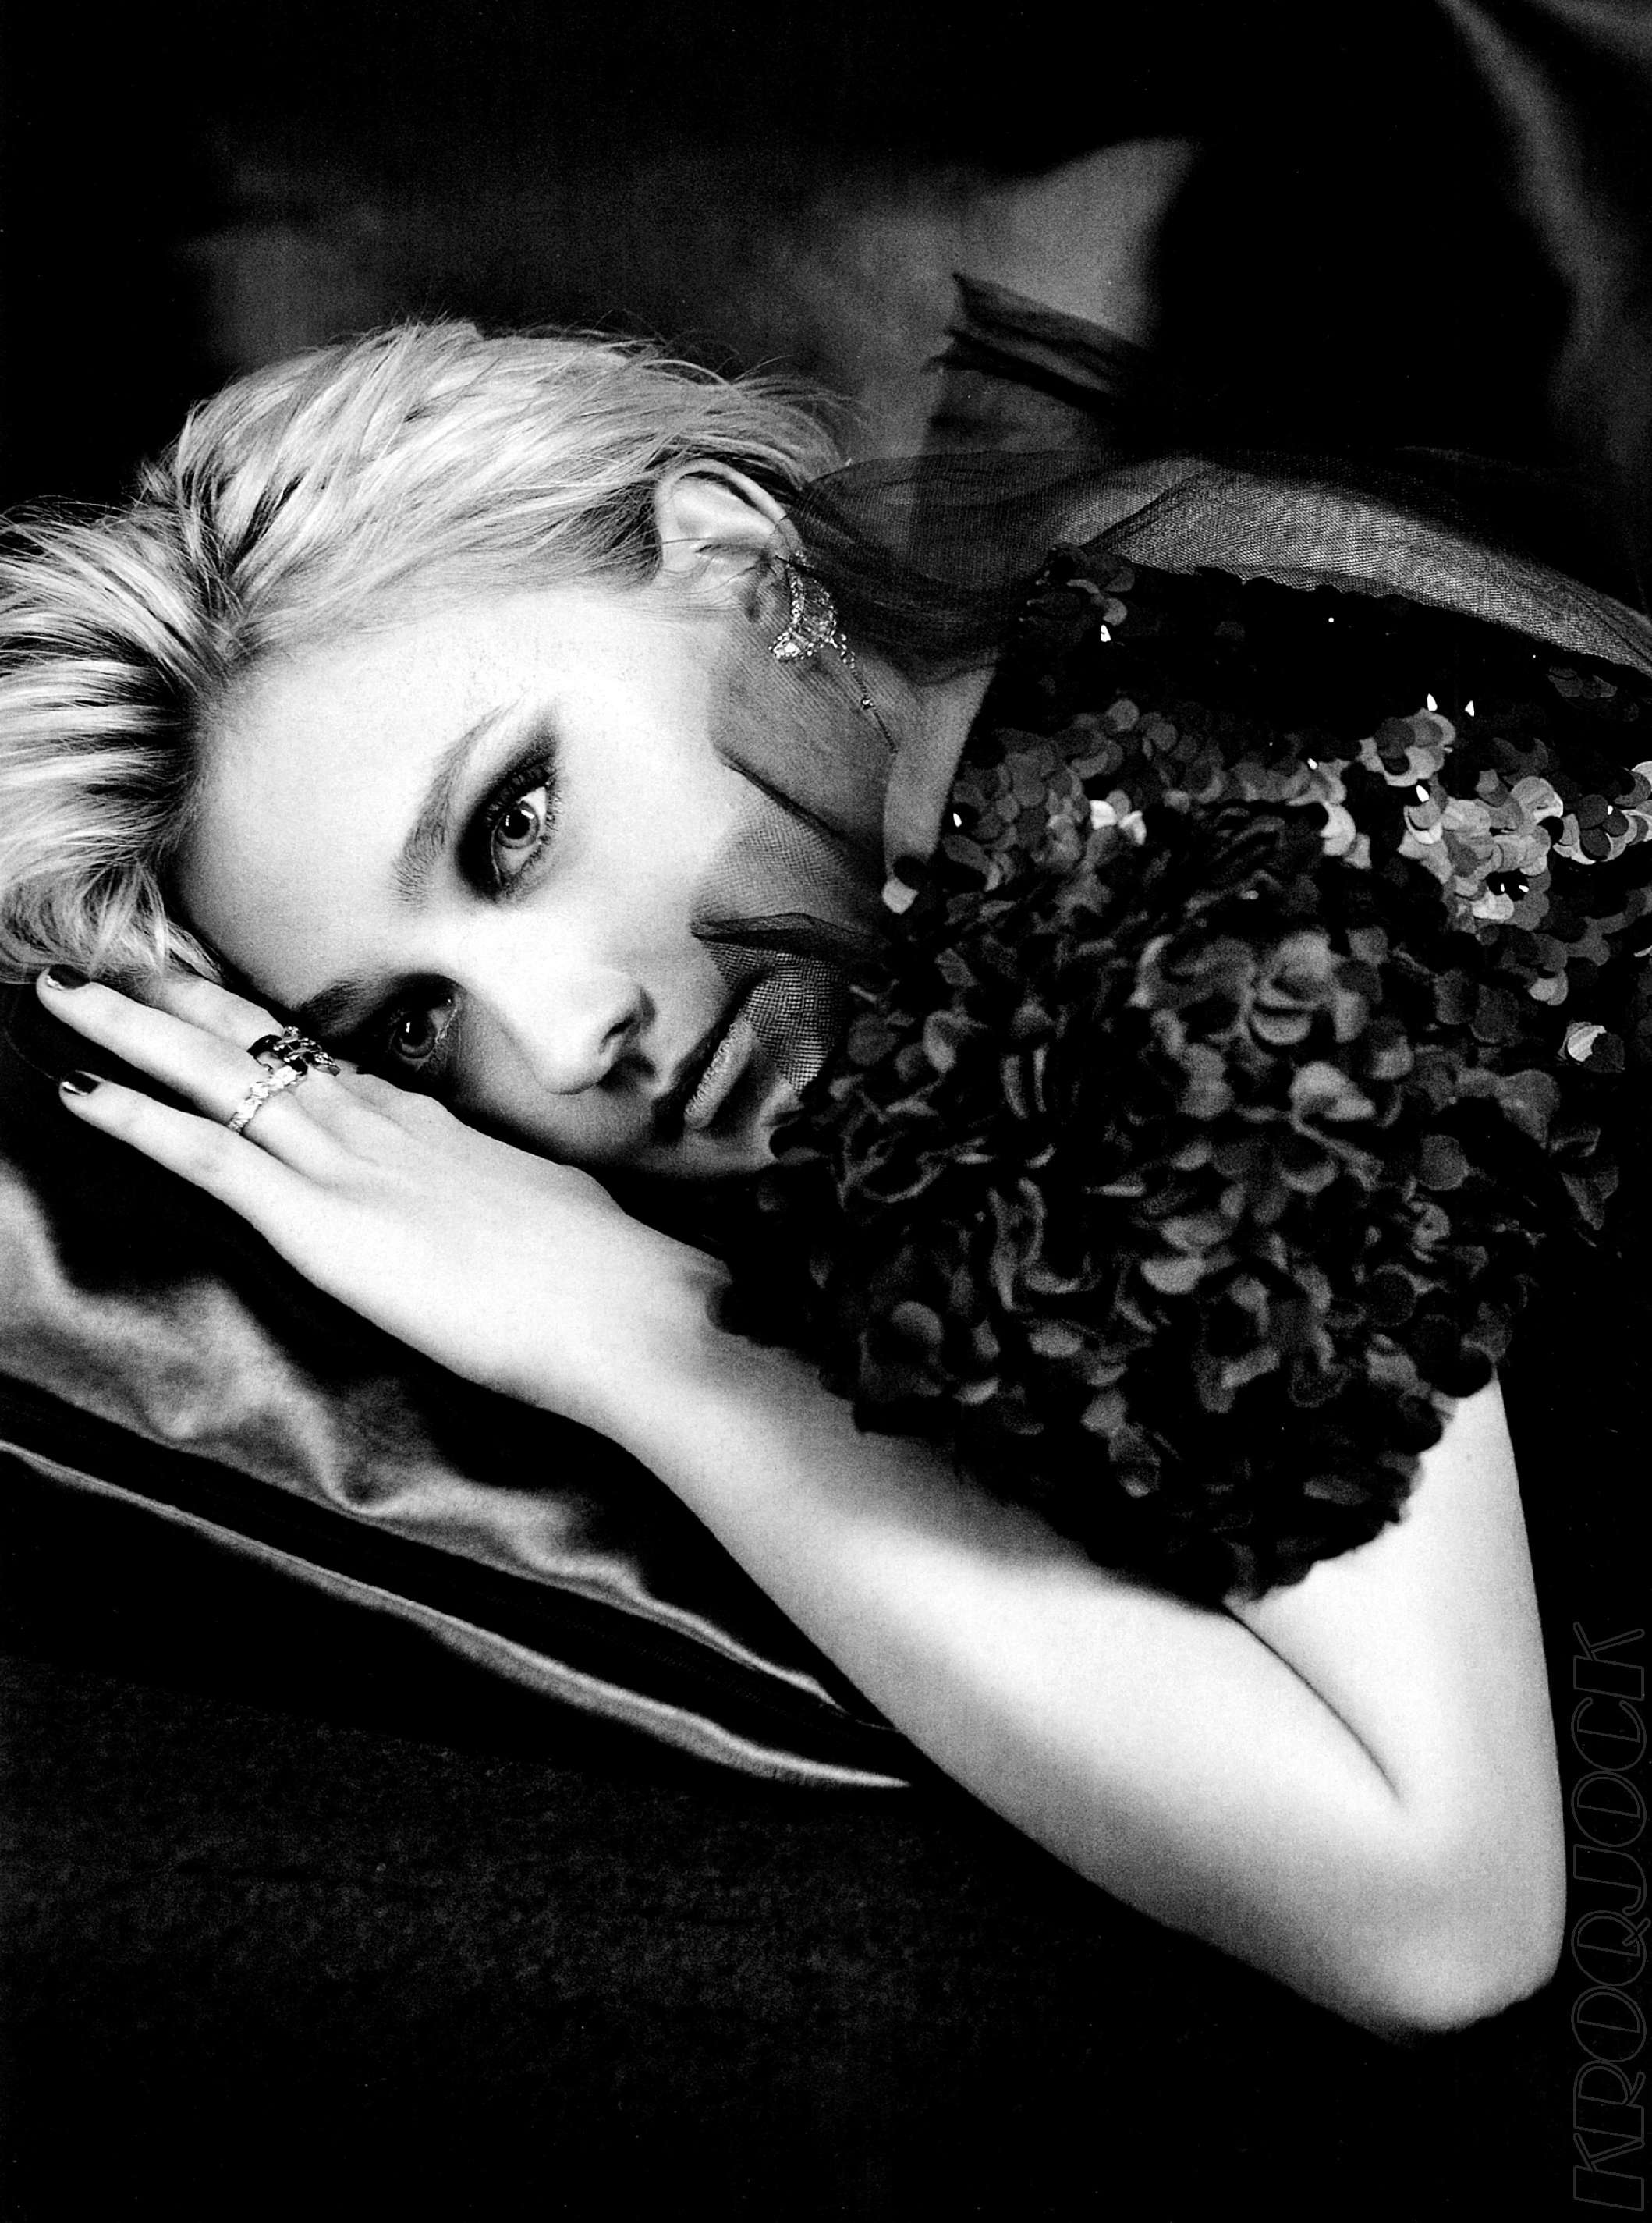 Dakota Fanning / Michael Sheen - Imagenes/Videos de Paparazzi / Estudio/ Eventos etc. - Página 5 Dakota01-2